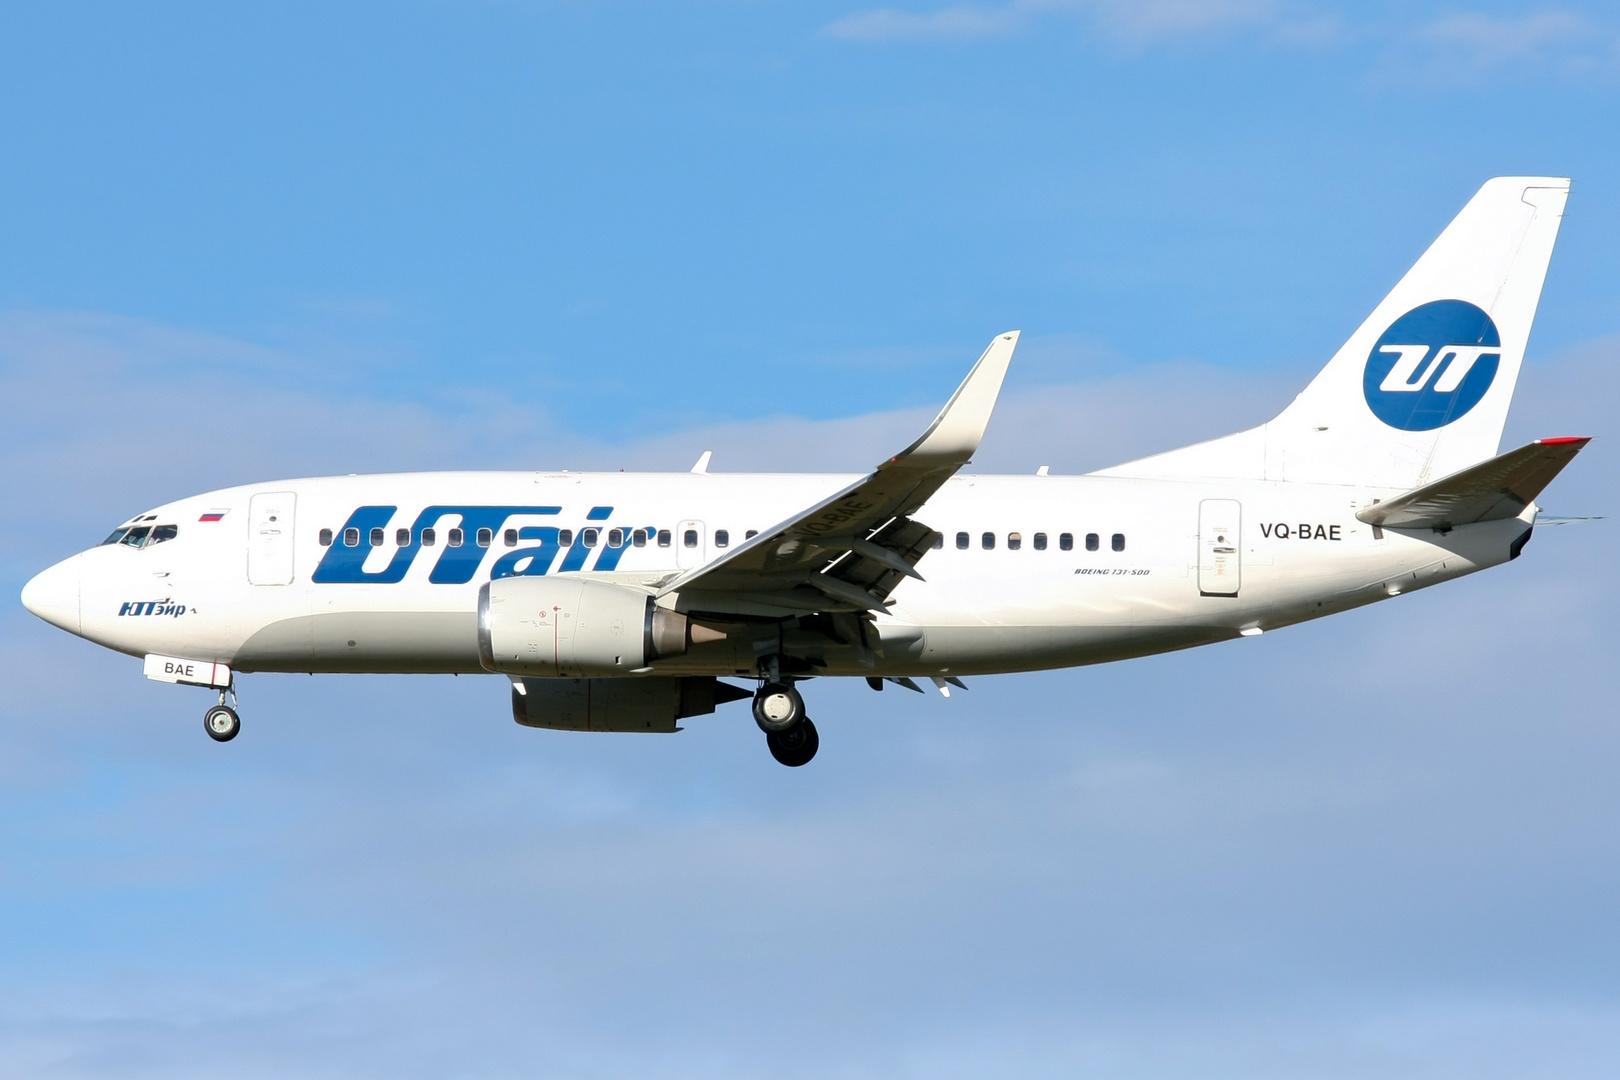 UT-Air